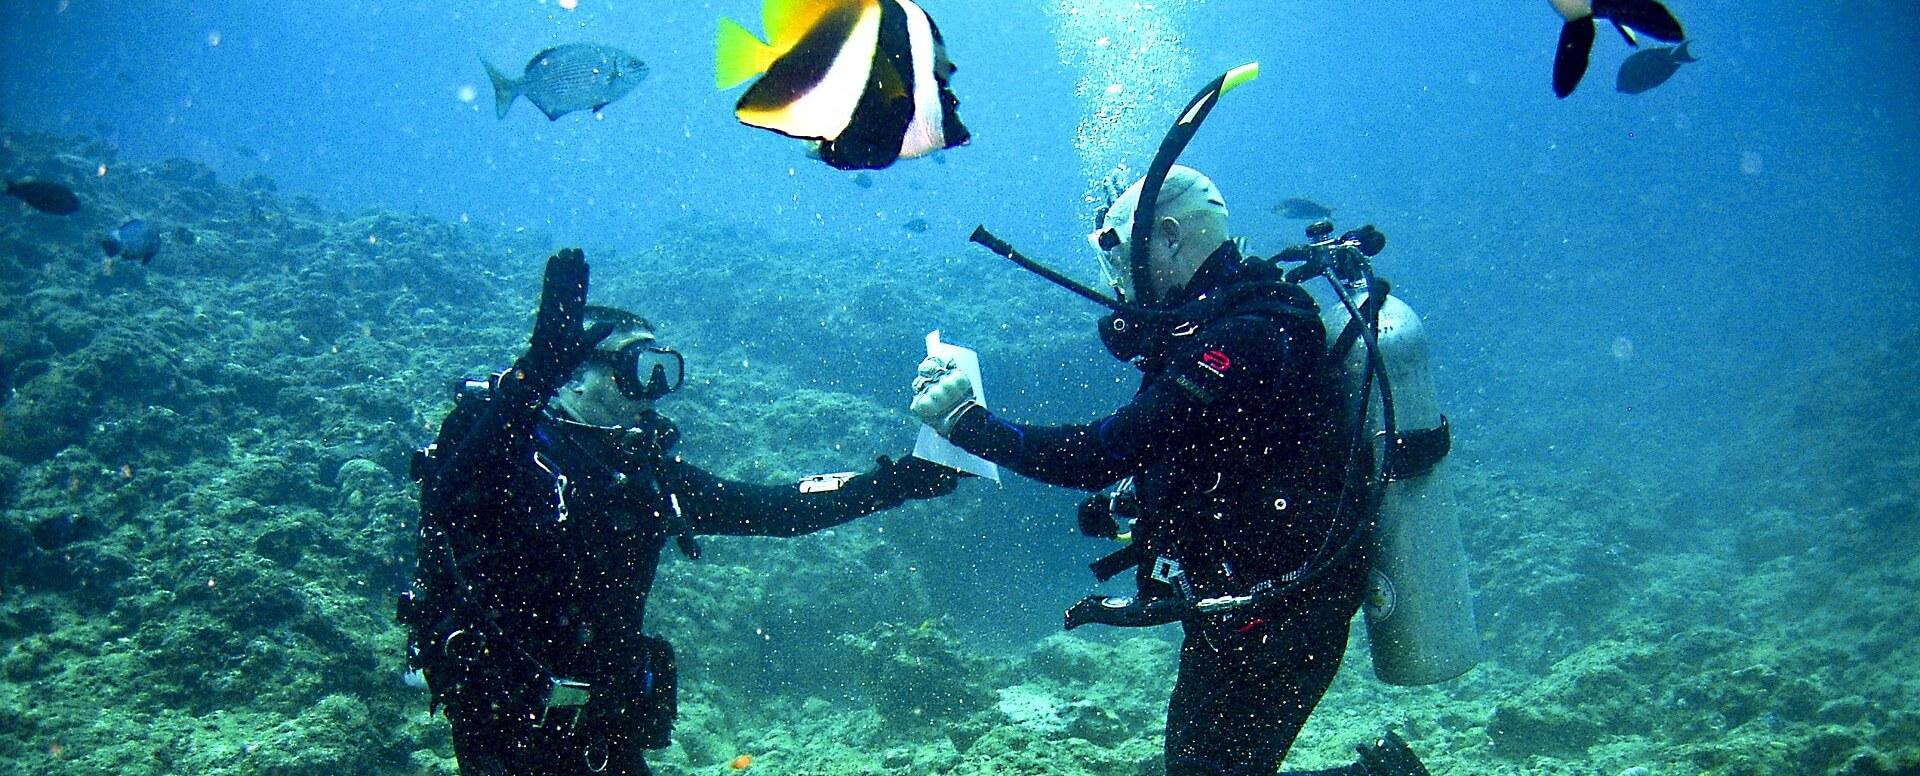 6. Plongée sous-marine - Île Maurice